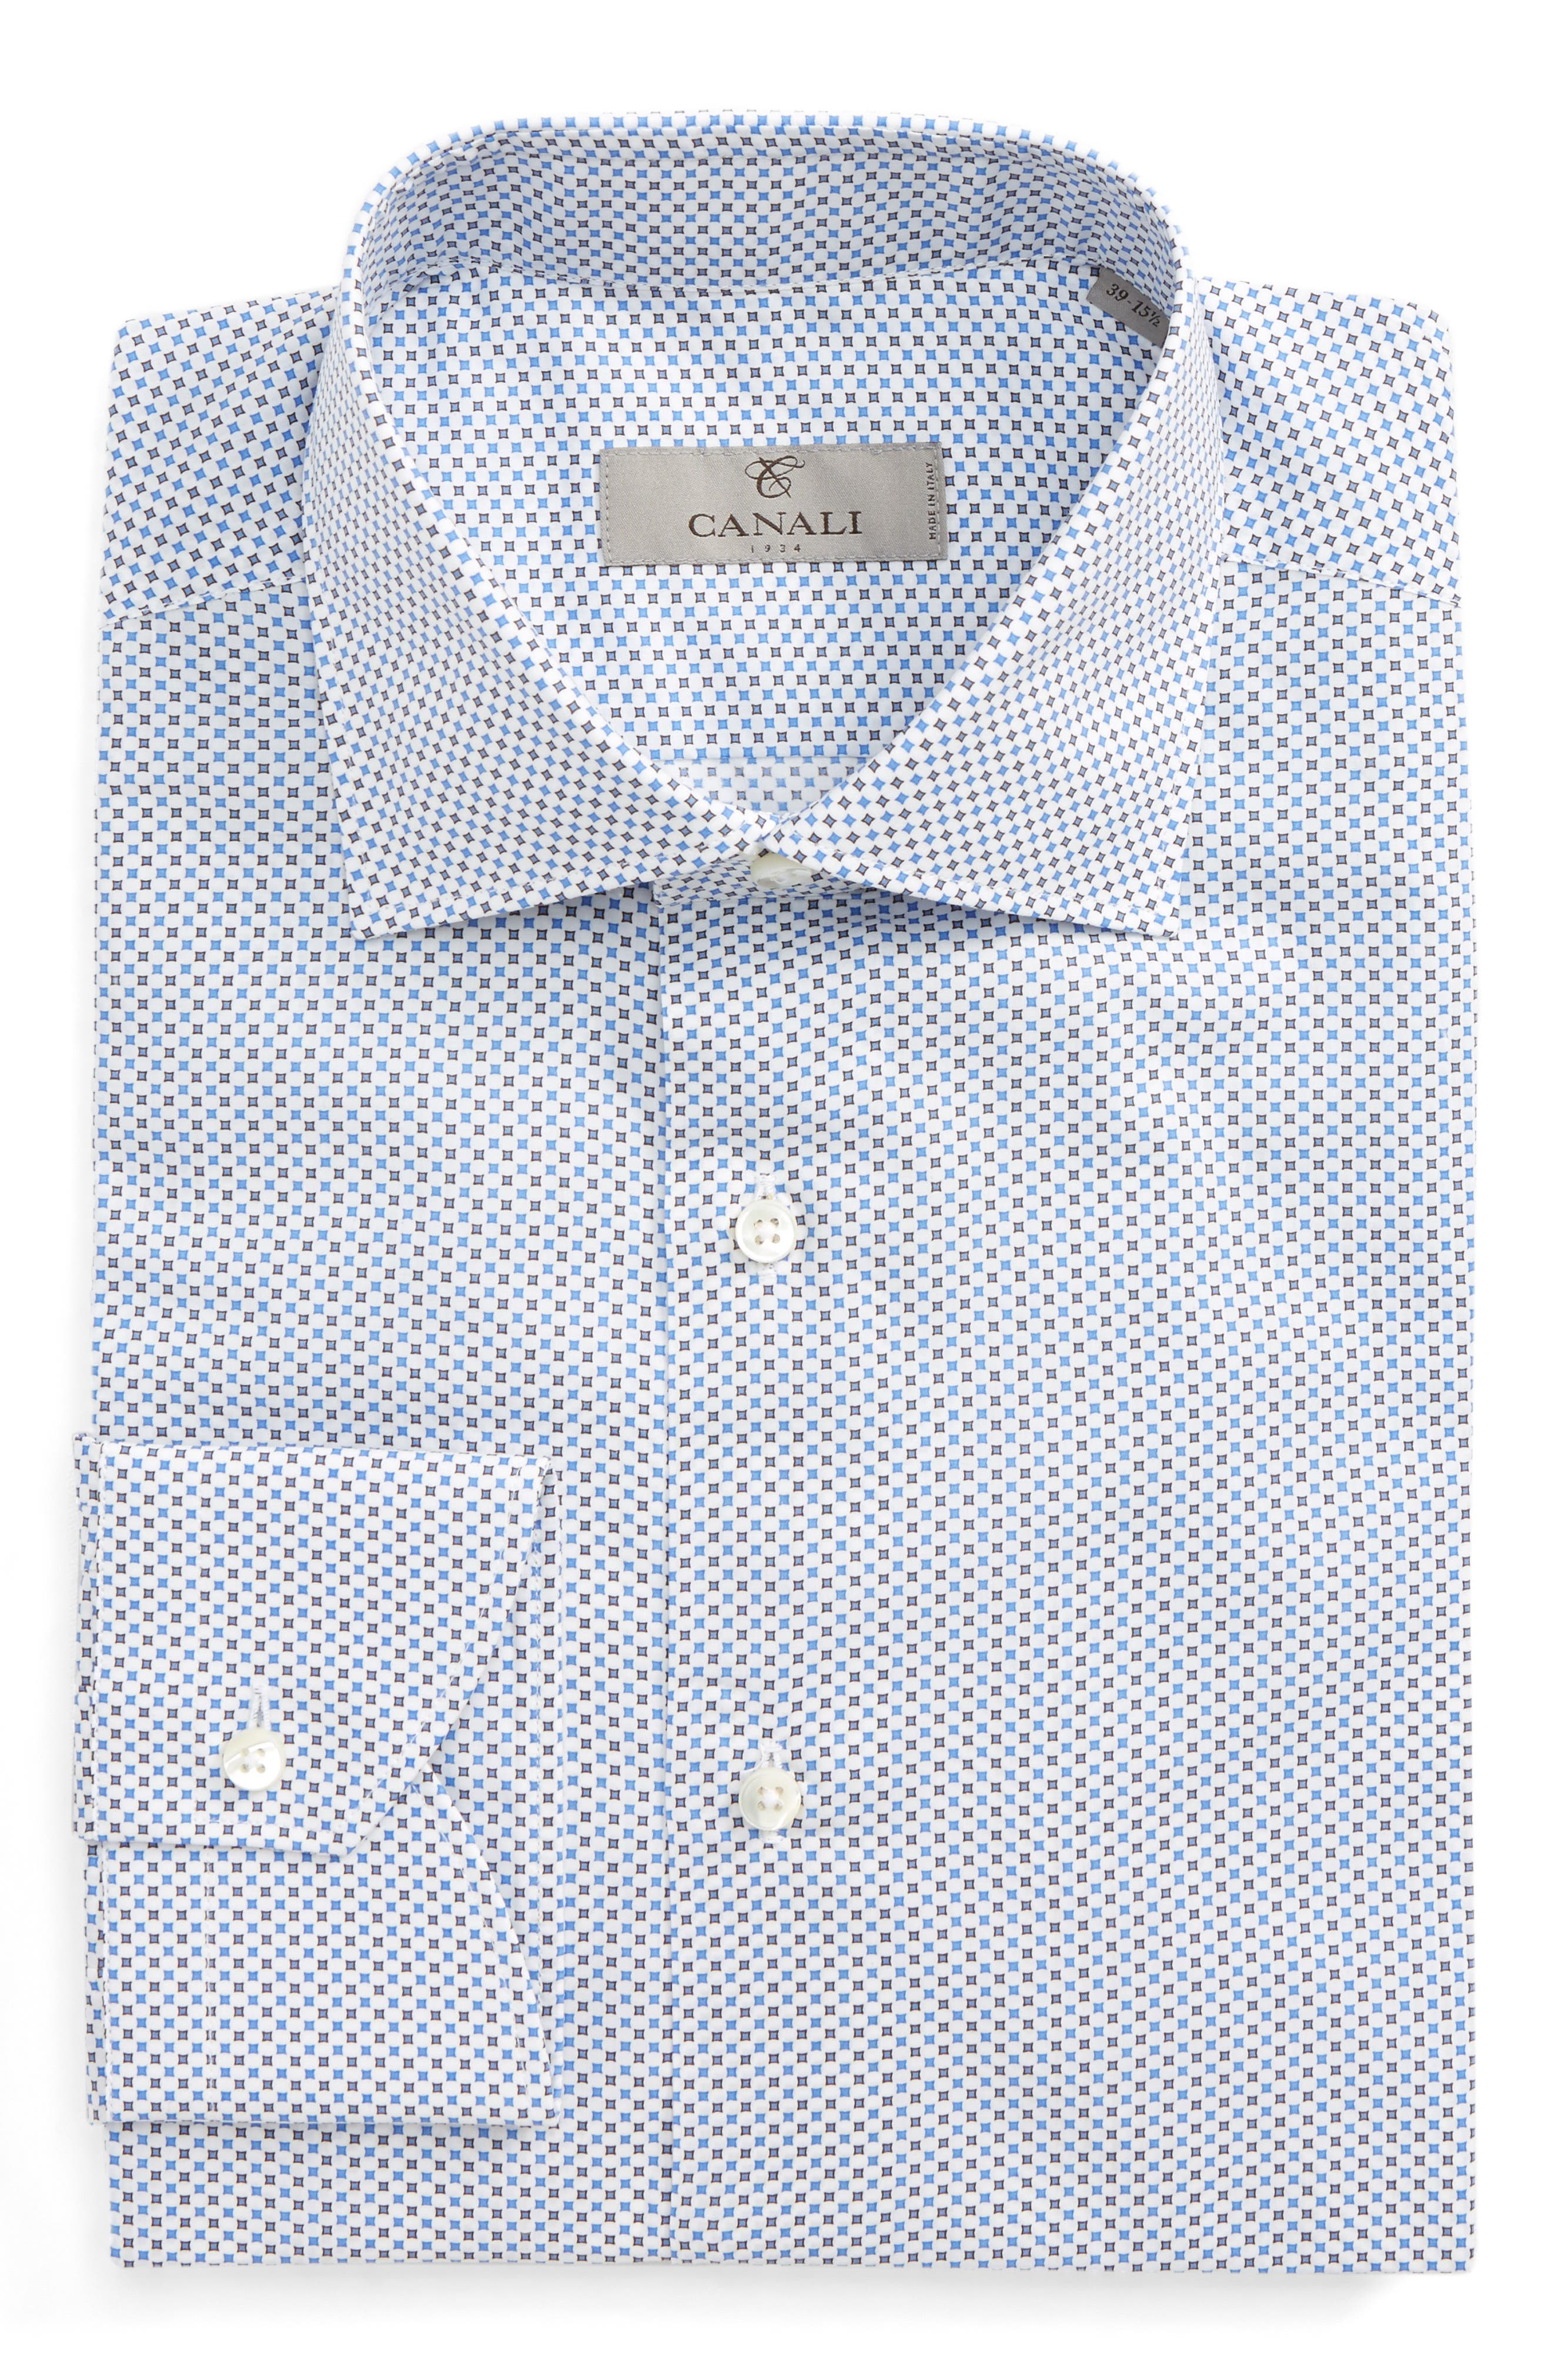 Regular Fit Print Dress Shirt,                             Main thumbnail 1, color,                             Light Blue